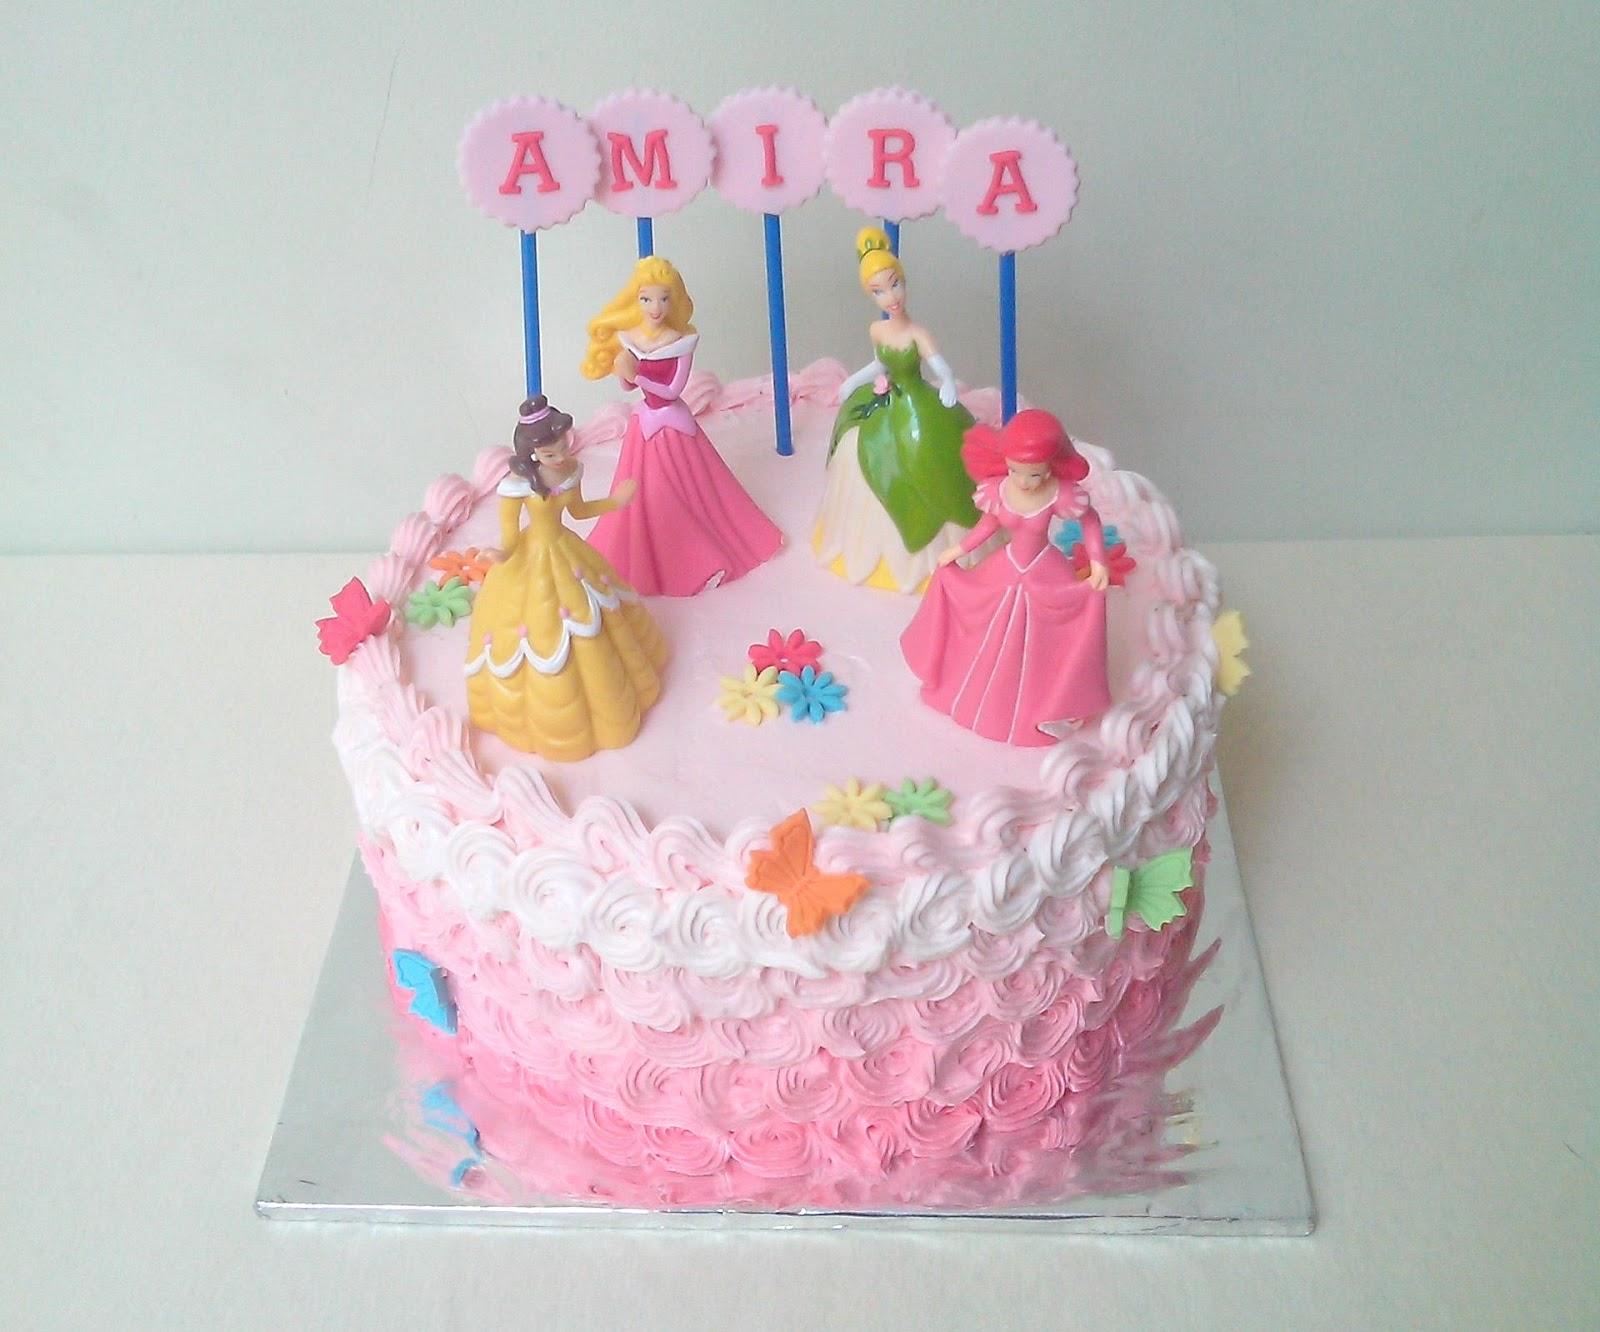 Mommindri Cakes Princes Cakes Dan 30 Pcs Individual Box Cupcakes